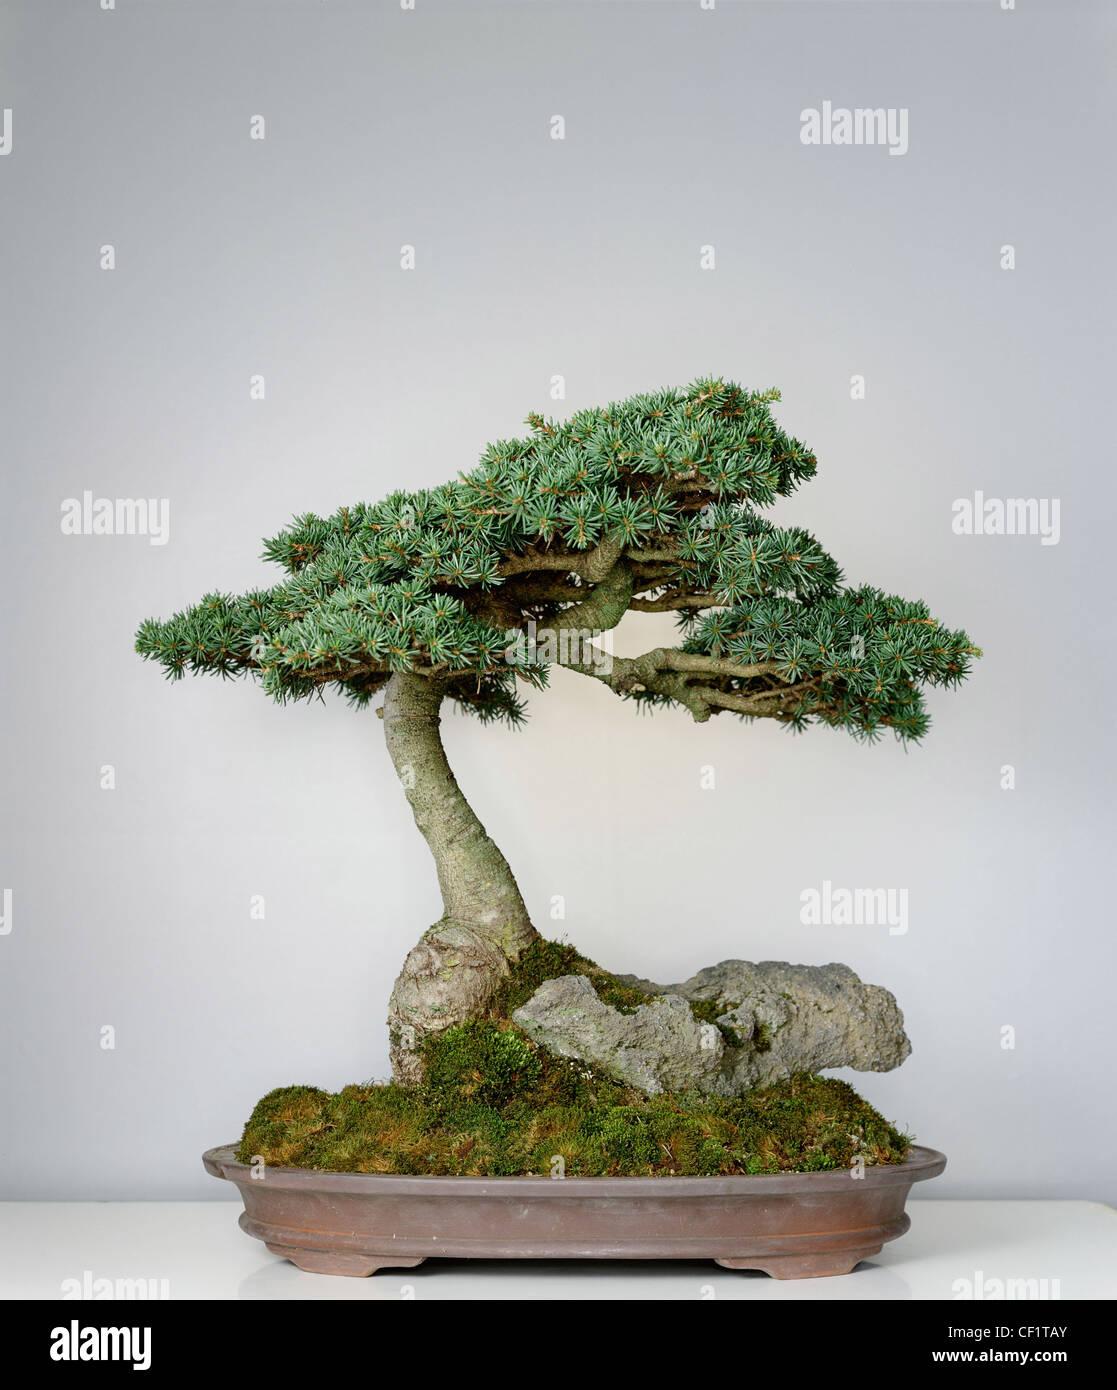 Douglas Fir Bonsai : douglas, bonsai, Bonsai, Resolution, Stock, Photography, Images, Alamy